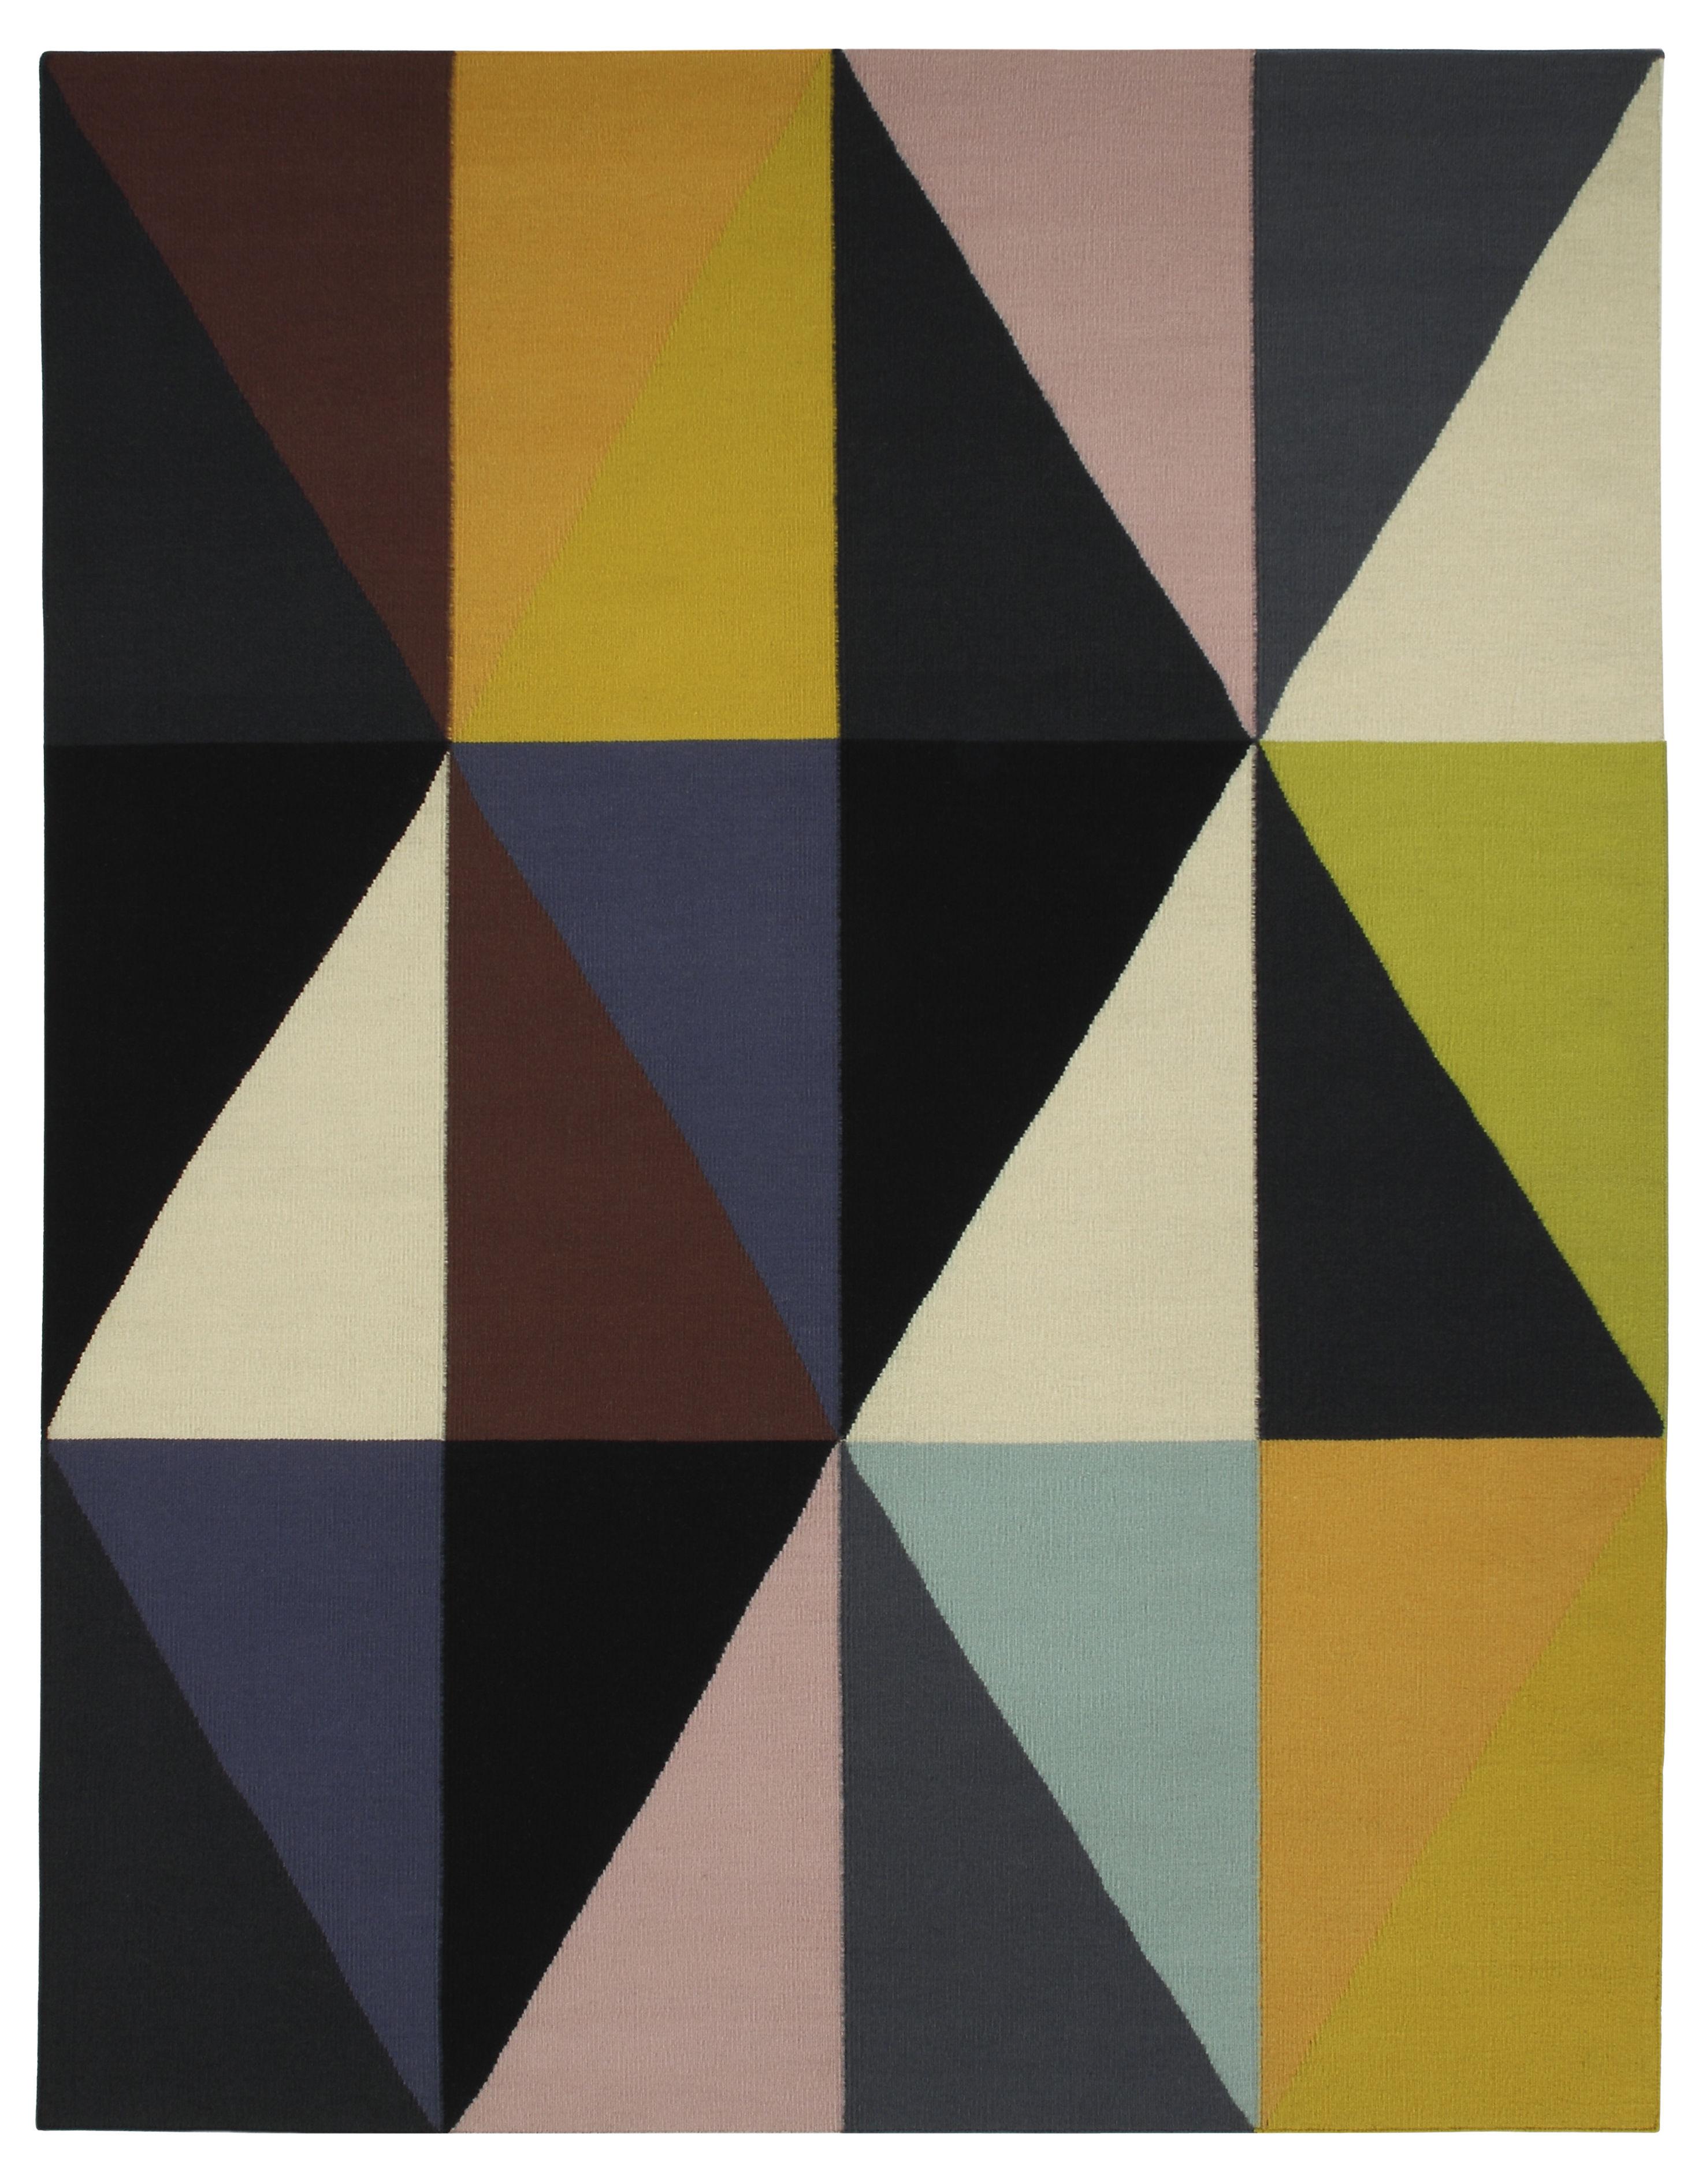 cult teppich 240 x 180 cm exklusives online angebot mehrfarbig by kinnasand made in design. Black Bedroom Furniture Sets. Home Design Ideas